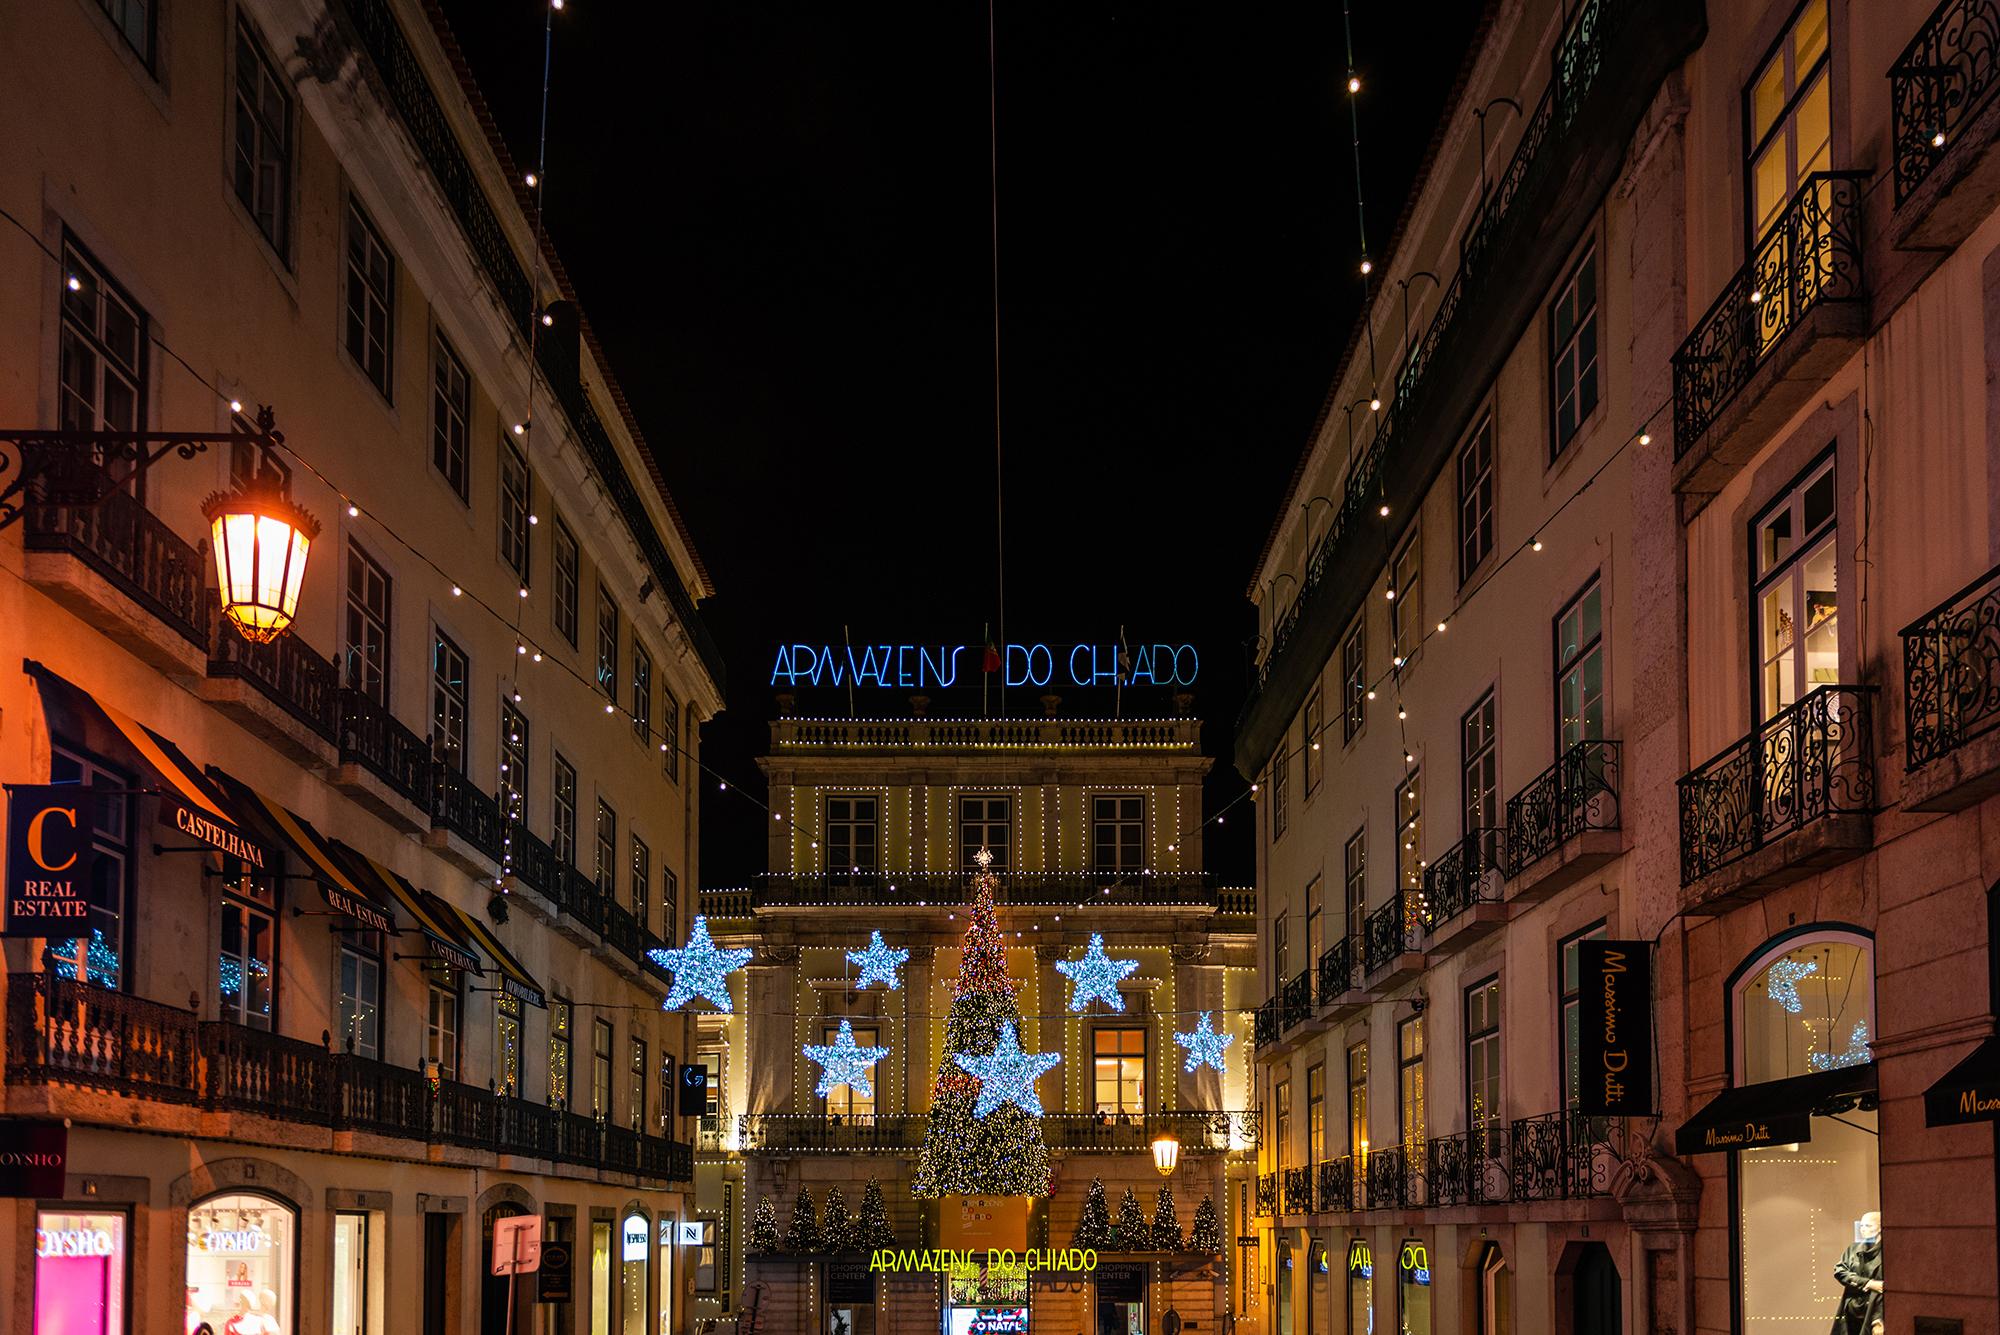 Illuminated main entrance to the Grandes Armazens do Chiado